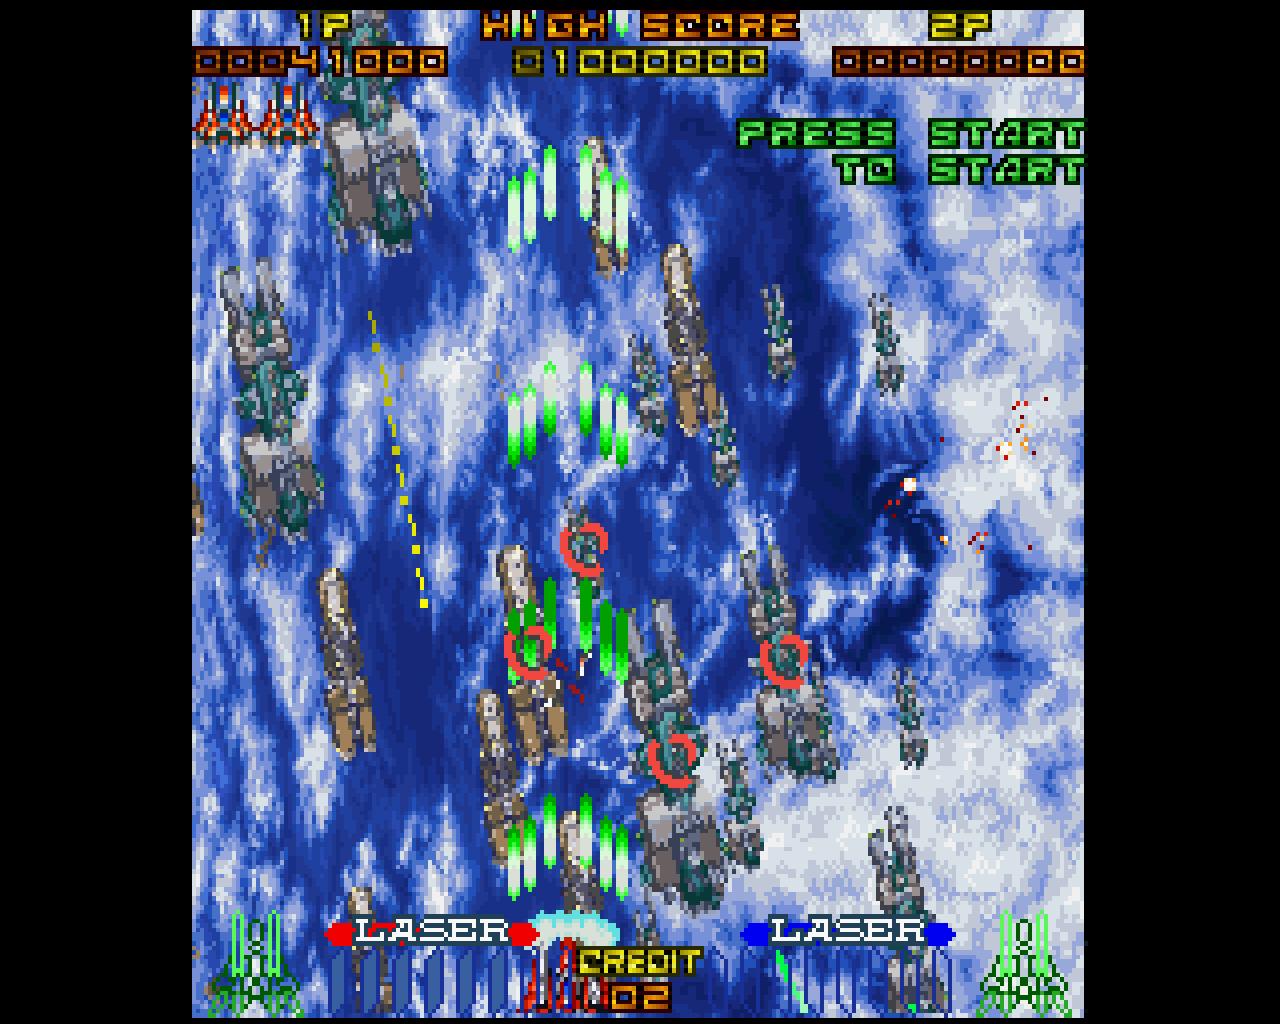 Figure 1 - Galactic Attack for the Sega Saturn running on ODROID-XU3/XU4